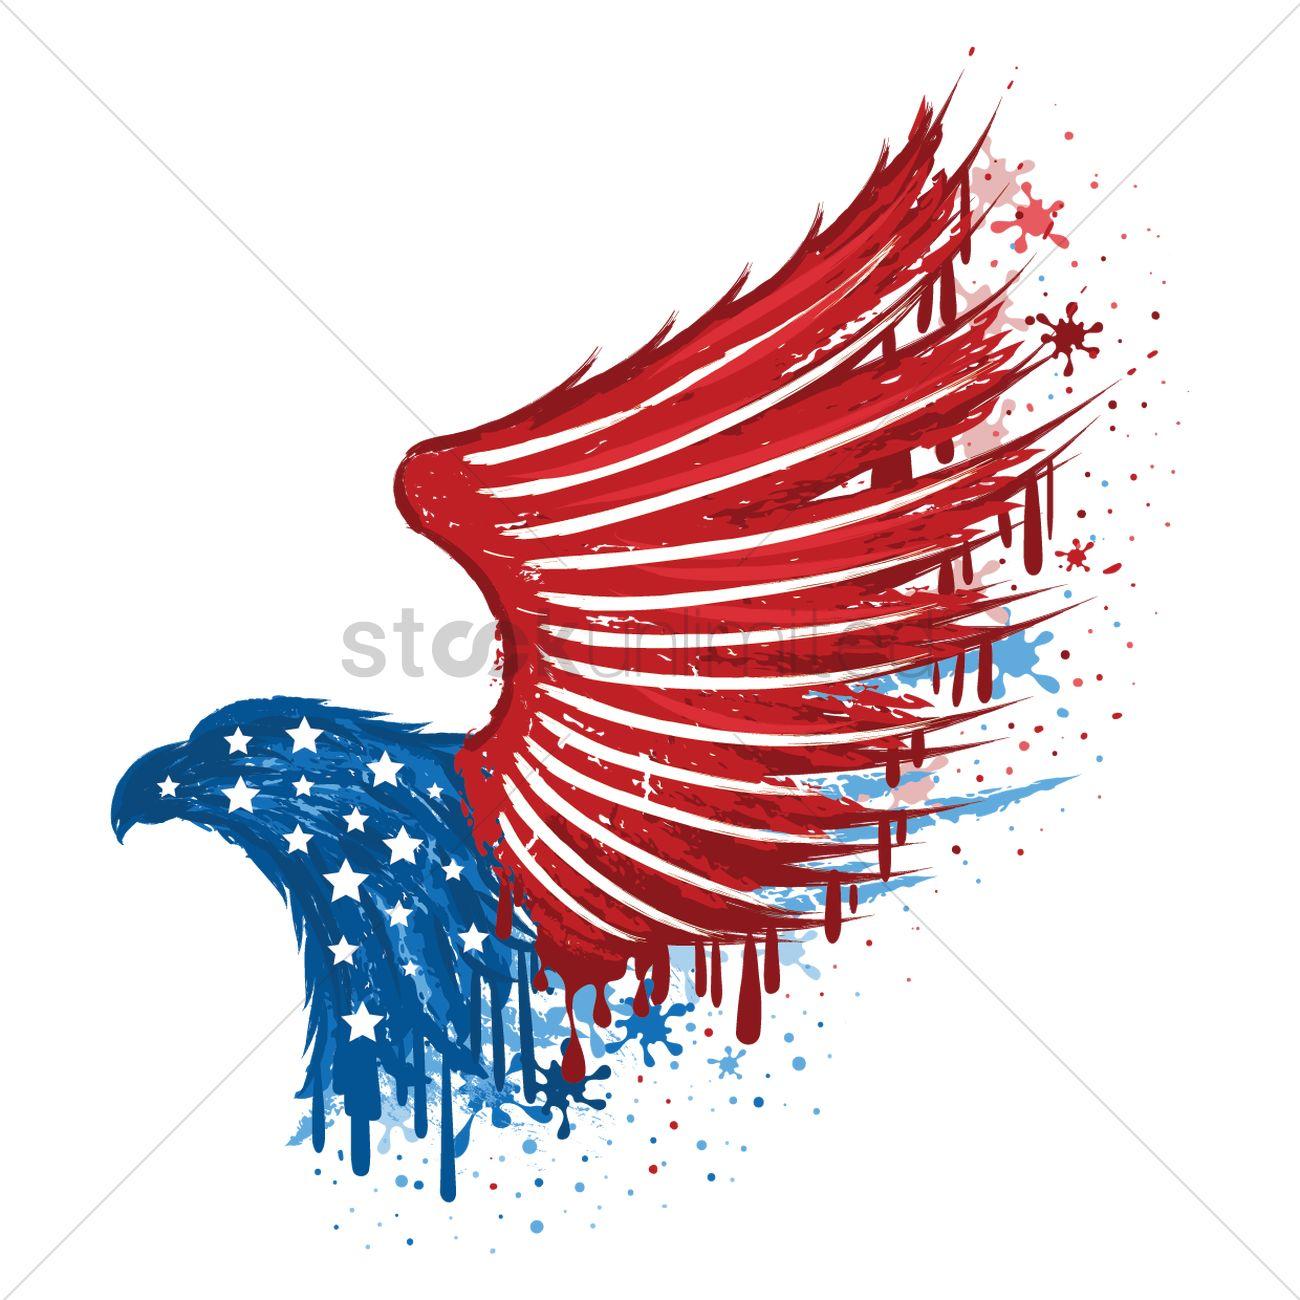 Usa eagle symbol vector image 1540758 stockunlimited usa eagle symbol vector graphic biocorpaavc Choice Image